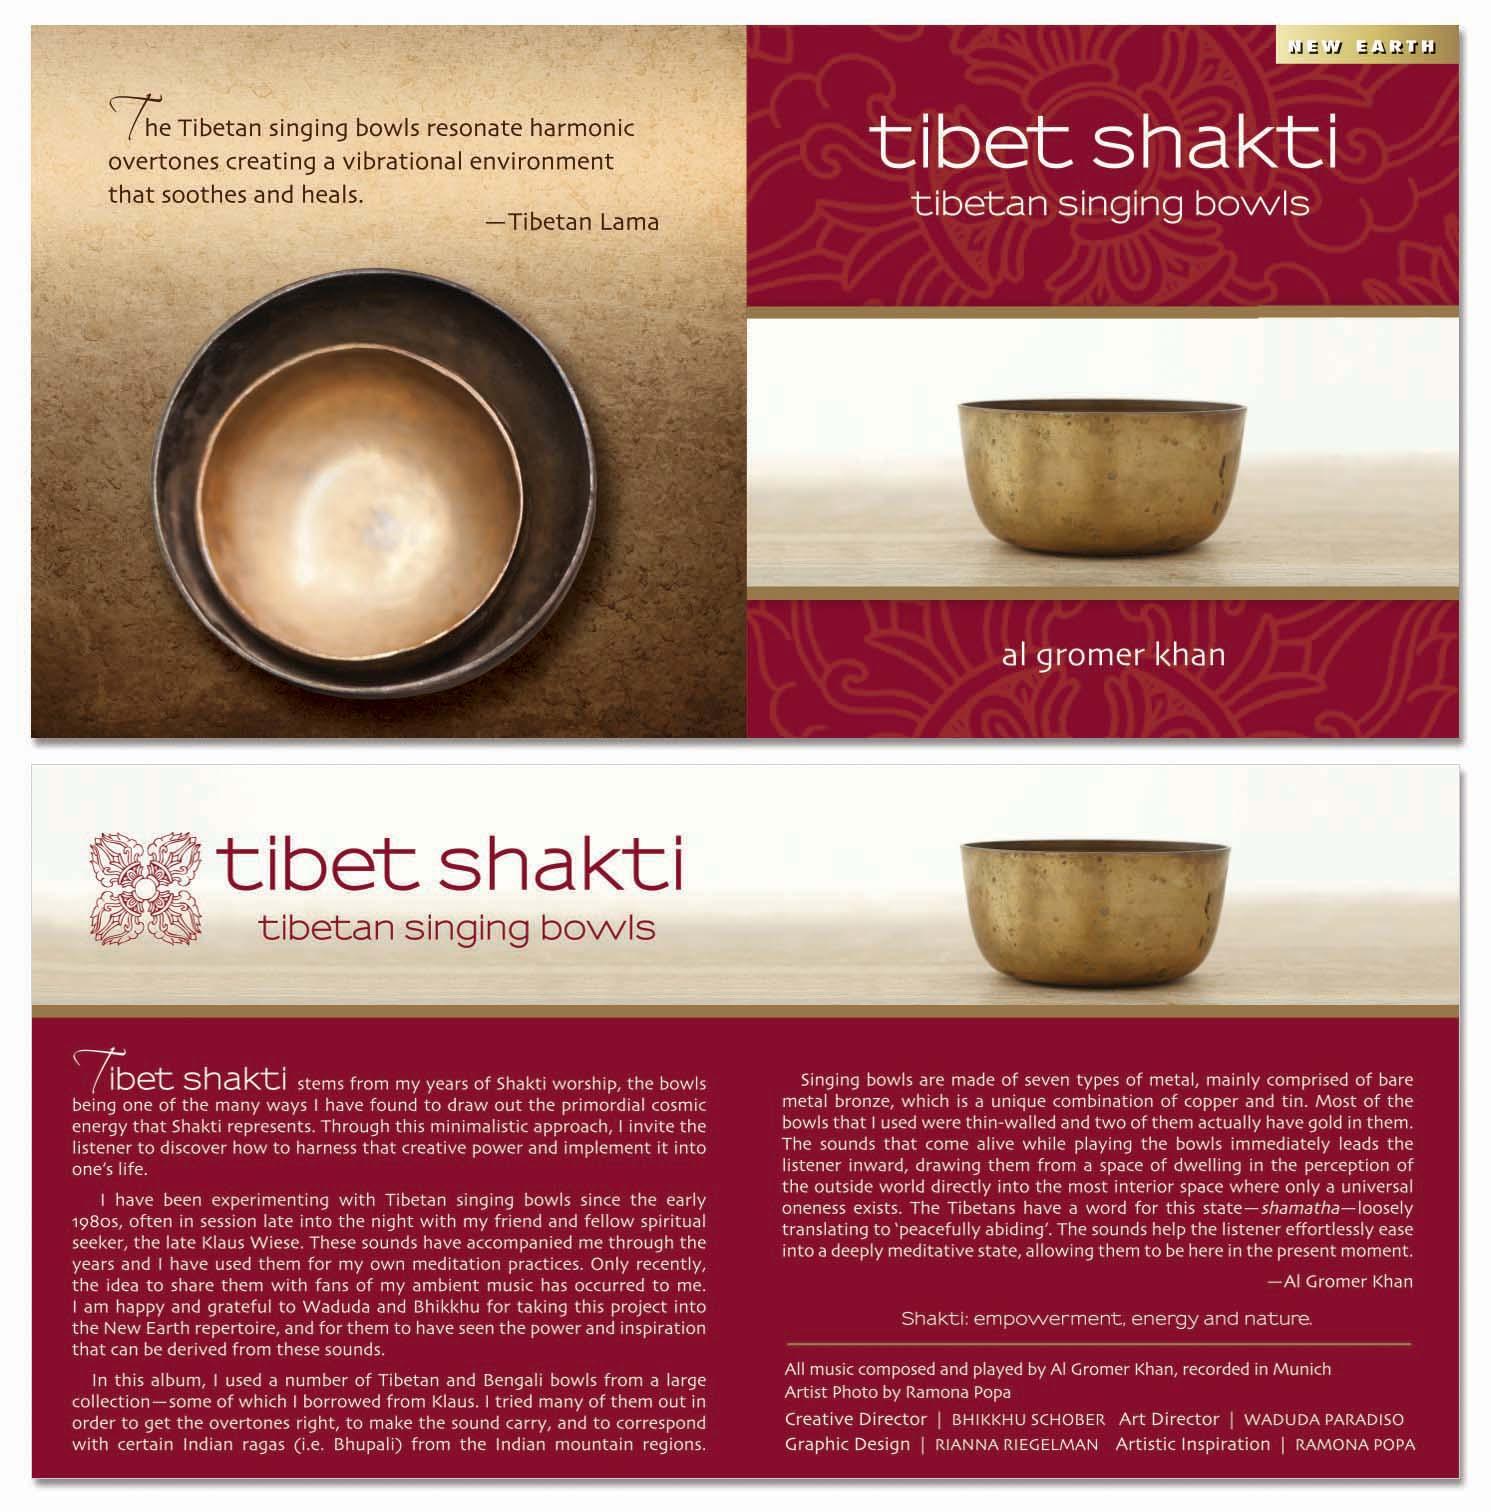 TibetShakti_4pg.indd